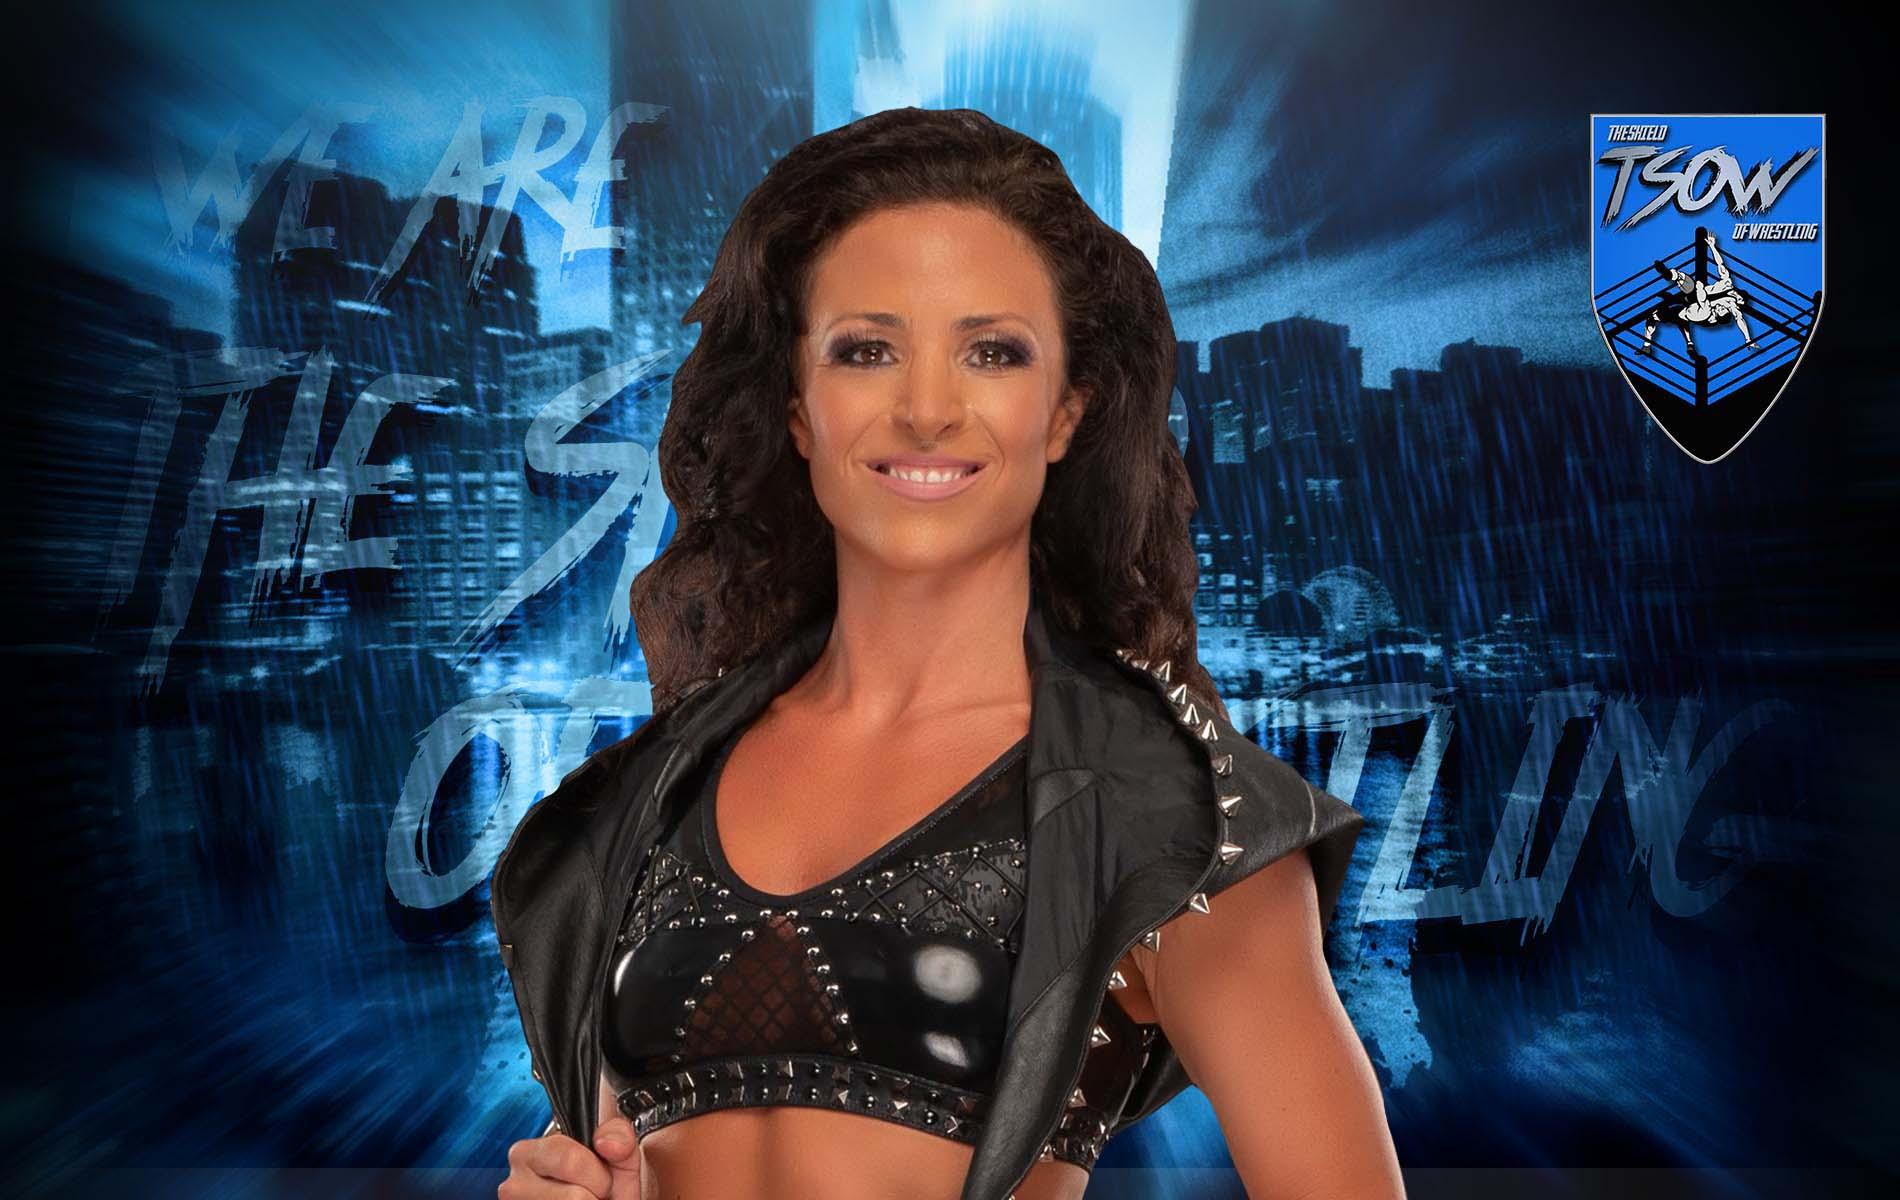 Serena Deeb perde l'NWA World Women's Championship